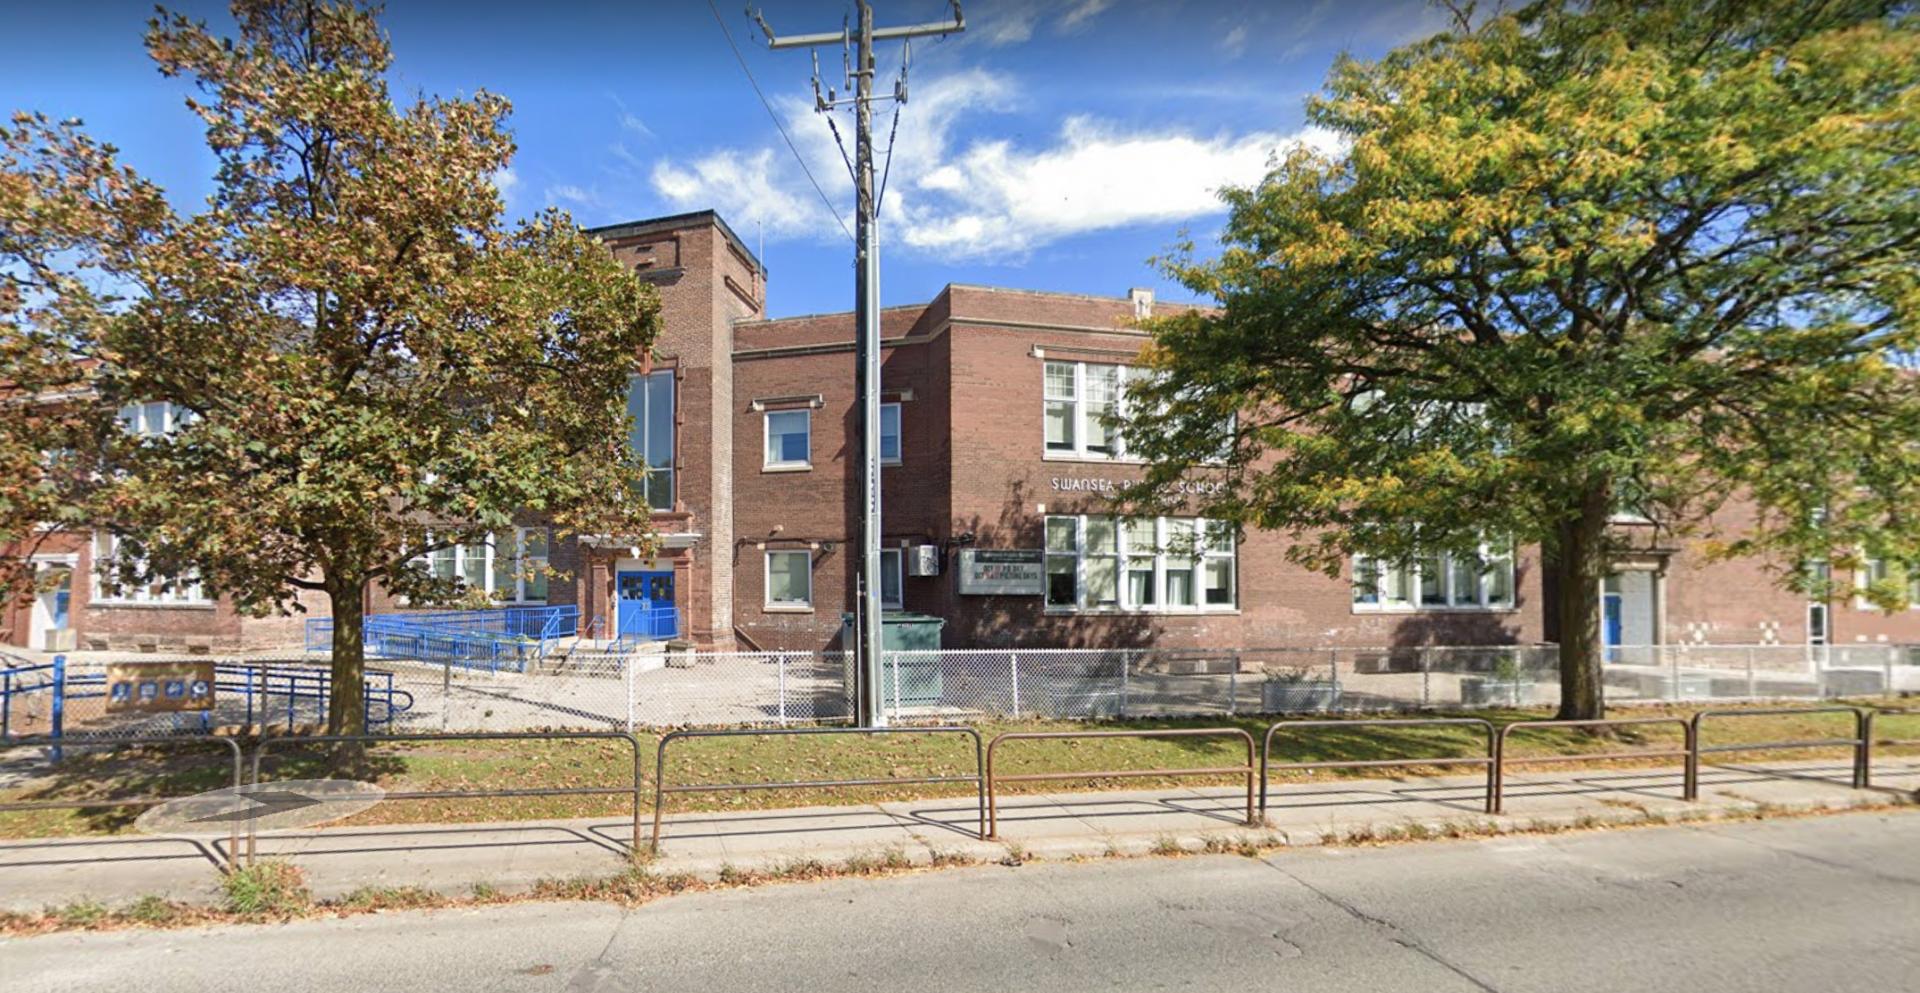 Staff coronavirus case forces Toronto kindergarten class to self-isolate